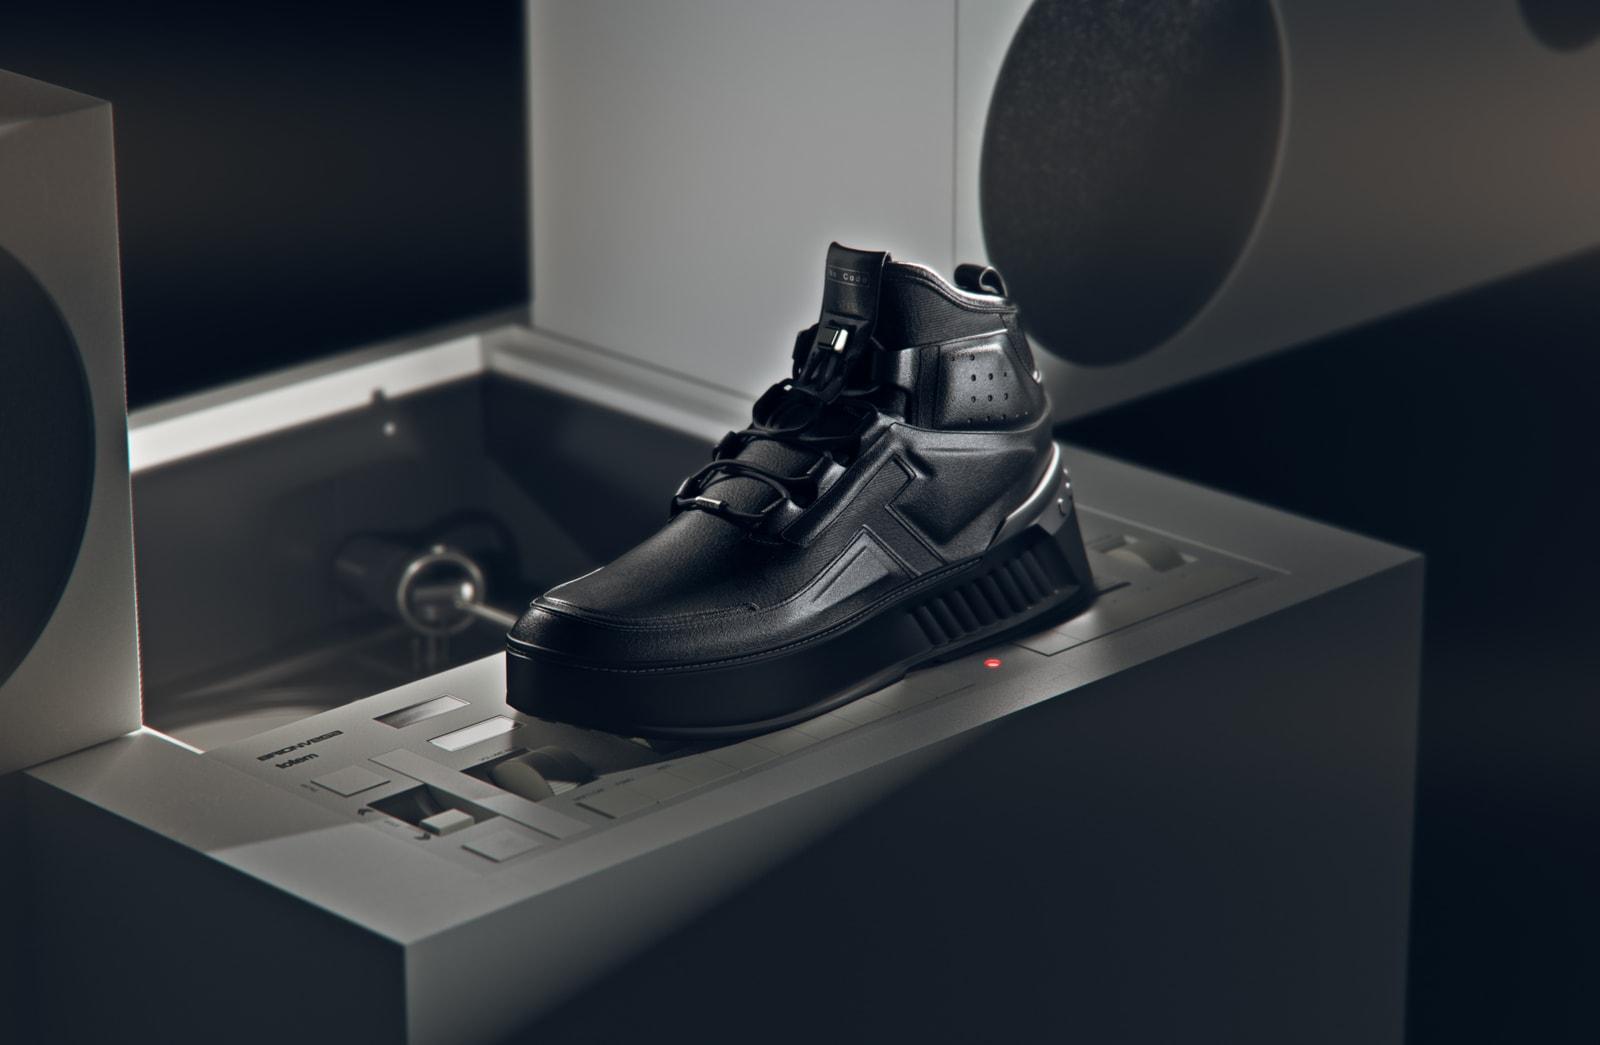 tods no code sneaker italian craftsmanship x project masters of design footwear november